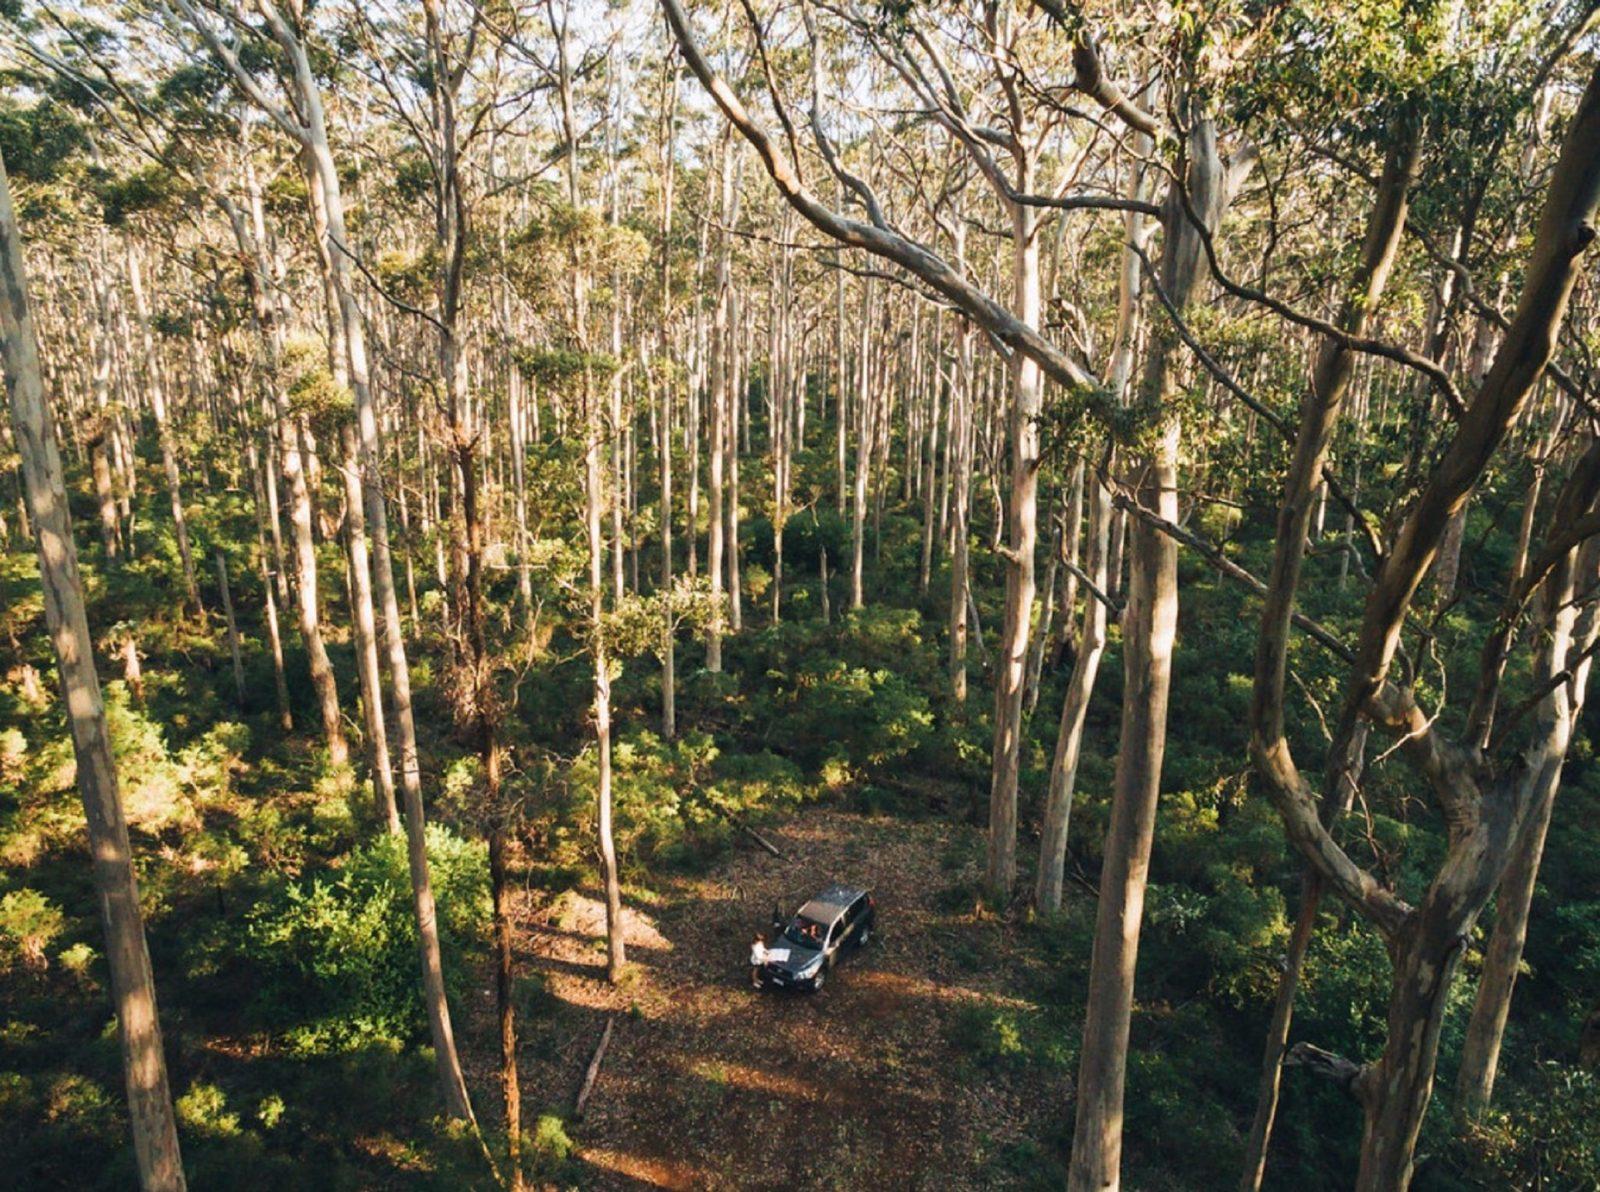 Leeuwin-Naturaliste National Park - Cowaramup, Cowaramup, Western Australia